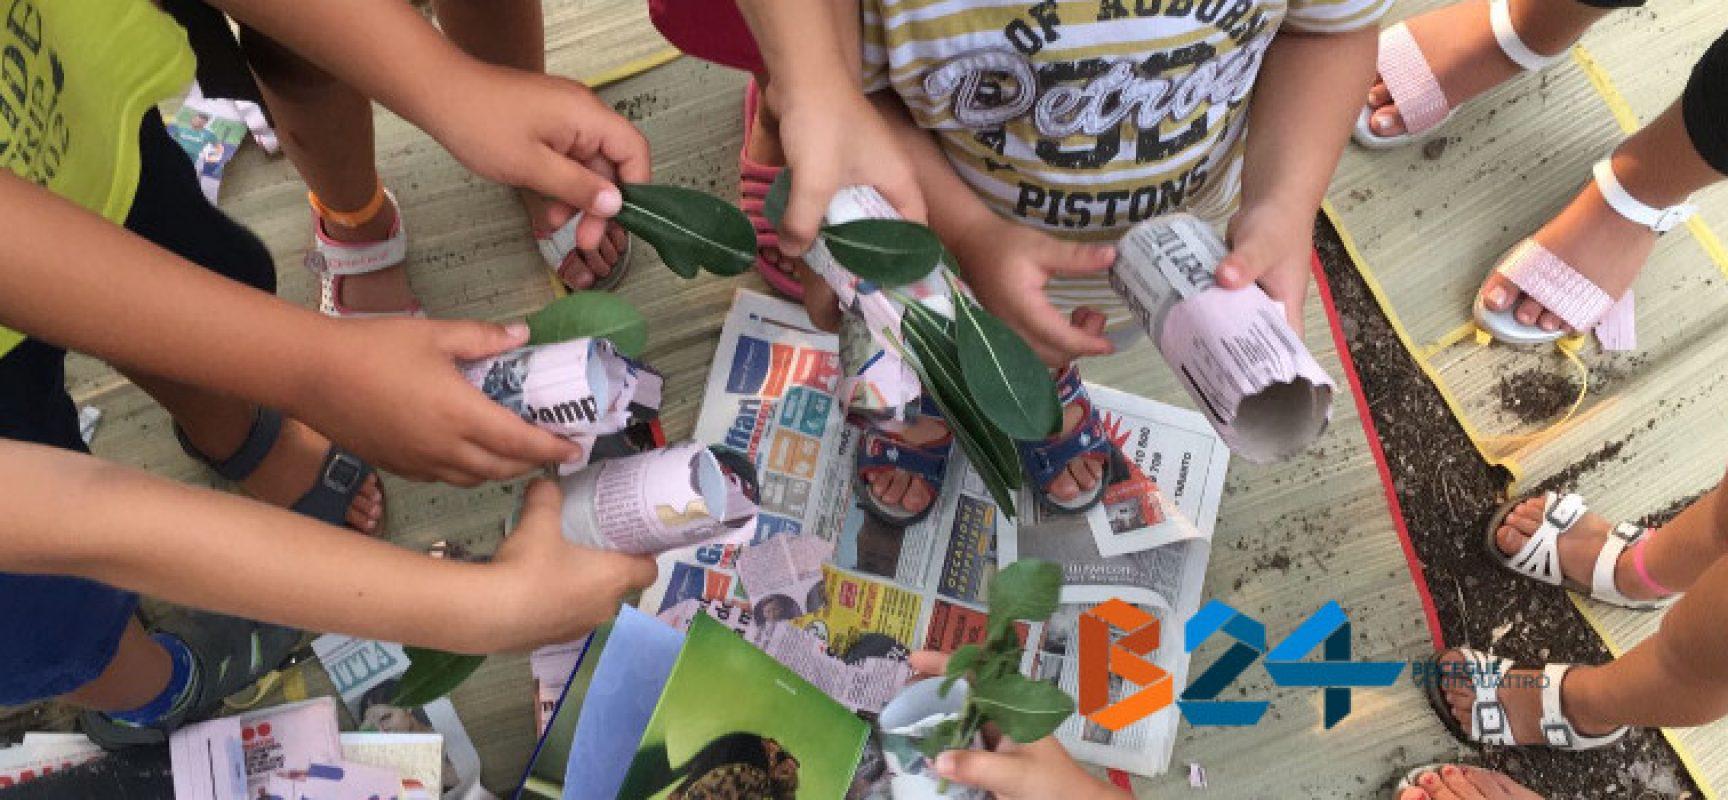 Al giardino botanico Veneziani i bimbi imparano divertendosi con la Summer Green School